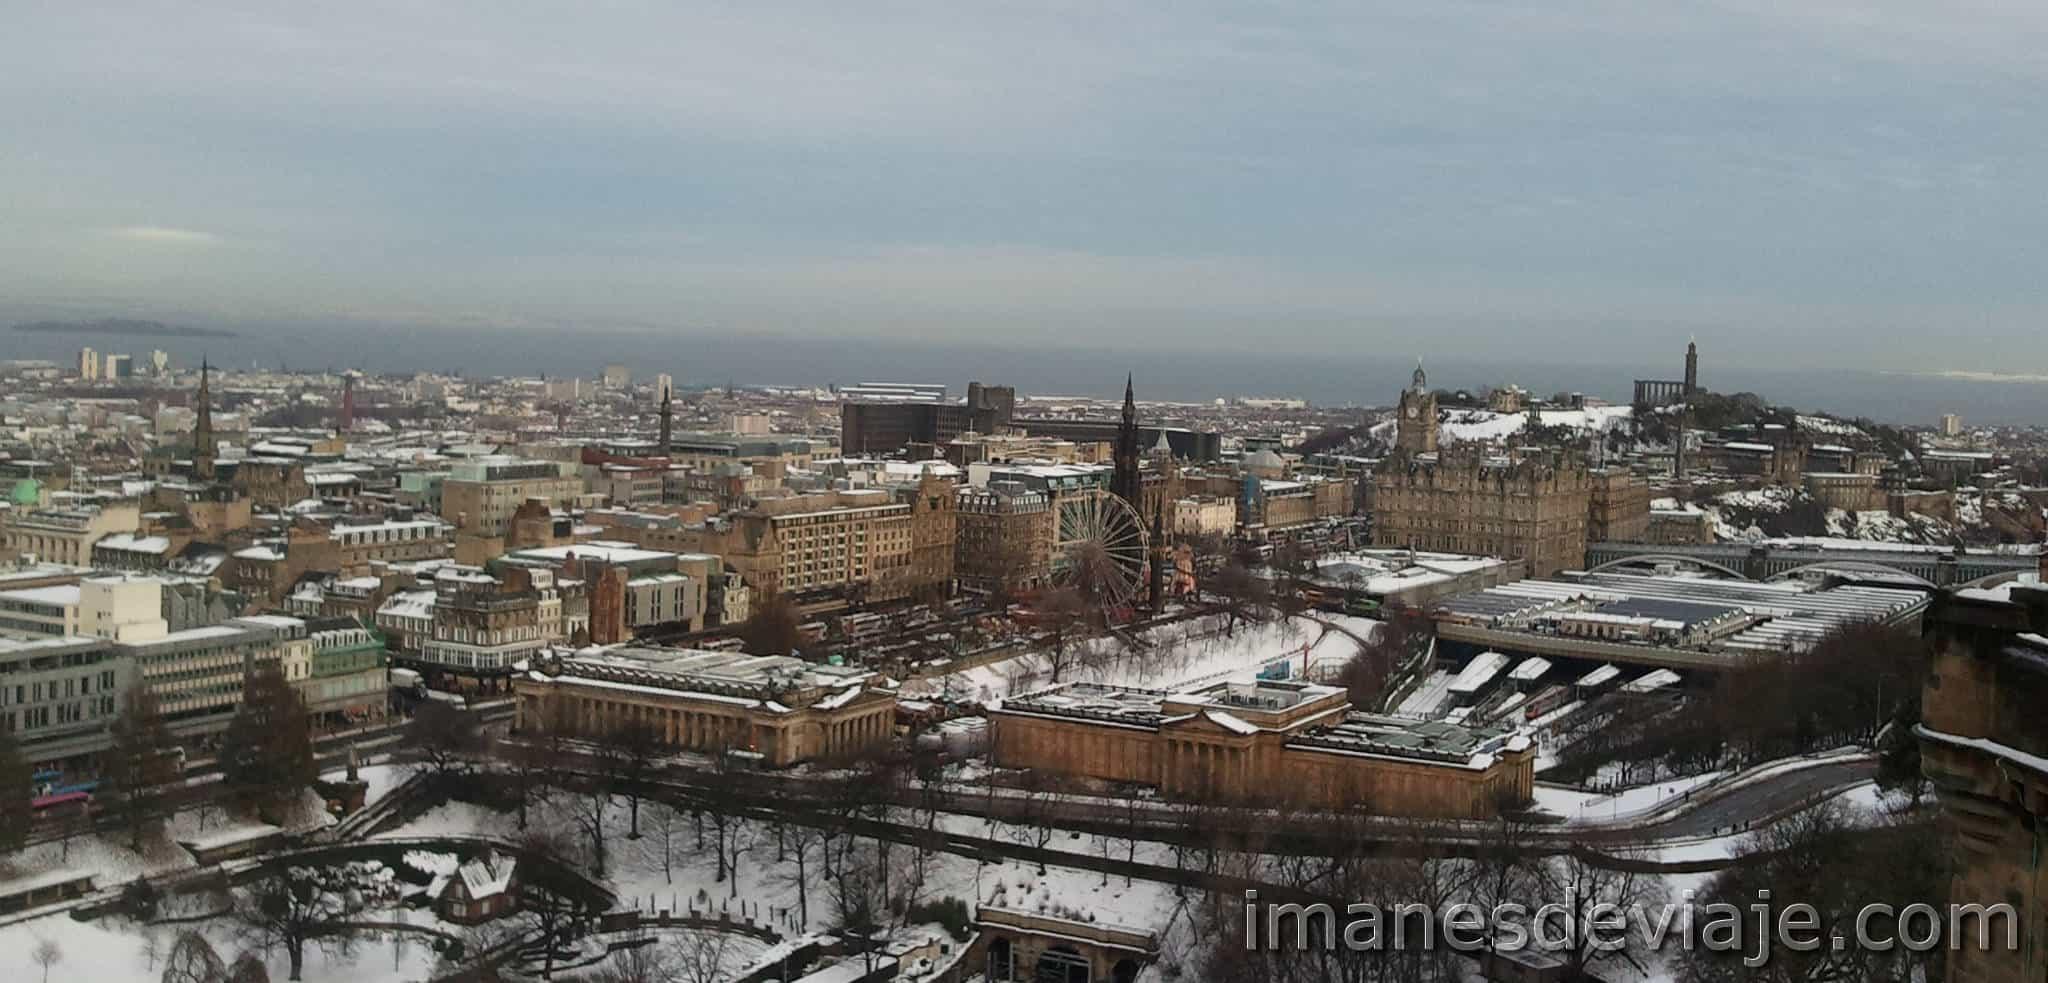 Ciudades más románticas de Europa_Edimburgo